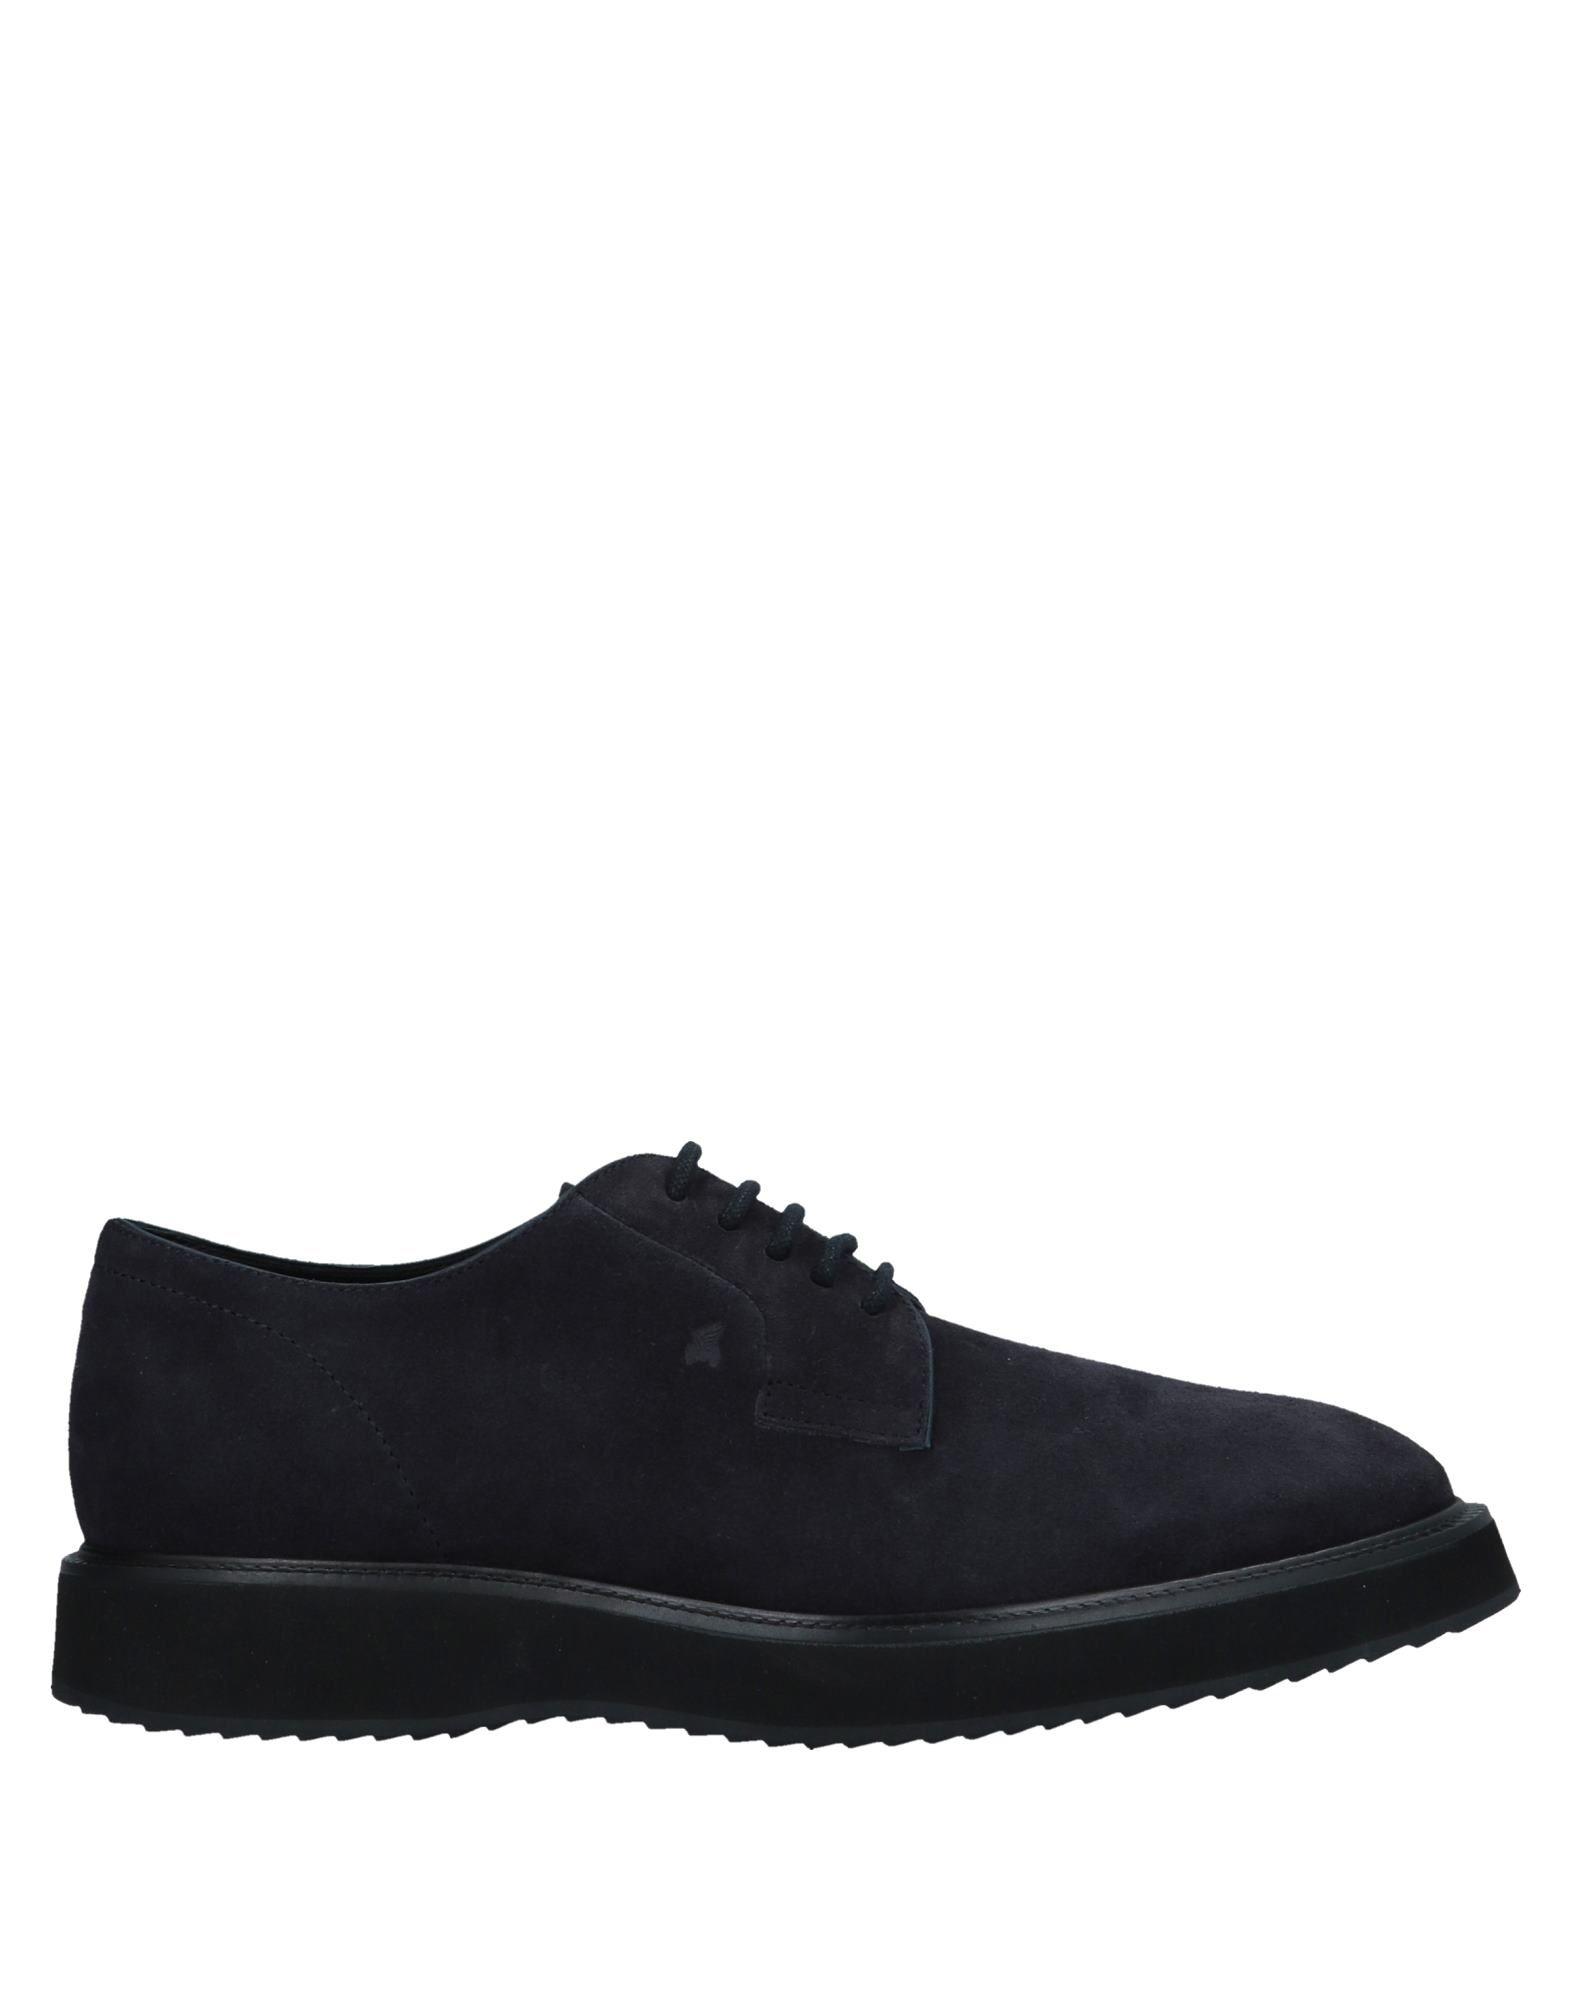 Hogan Schnürschuhe Herren  11543446PU Gute Qualität beliebte Schuhe